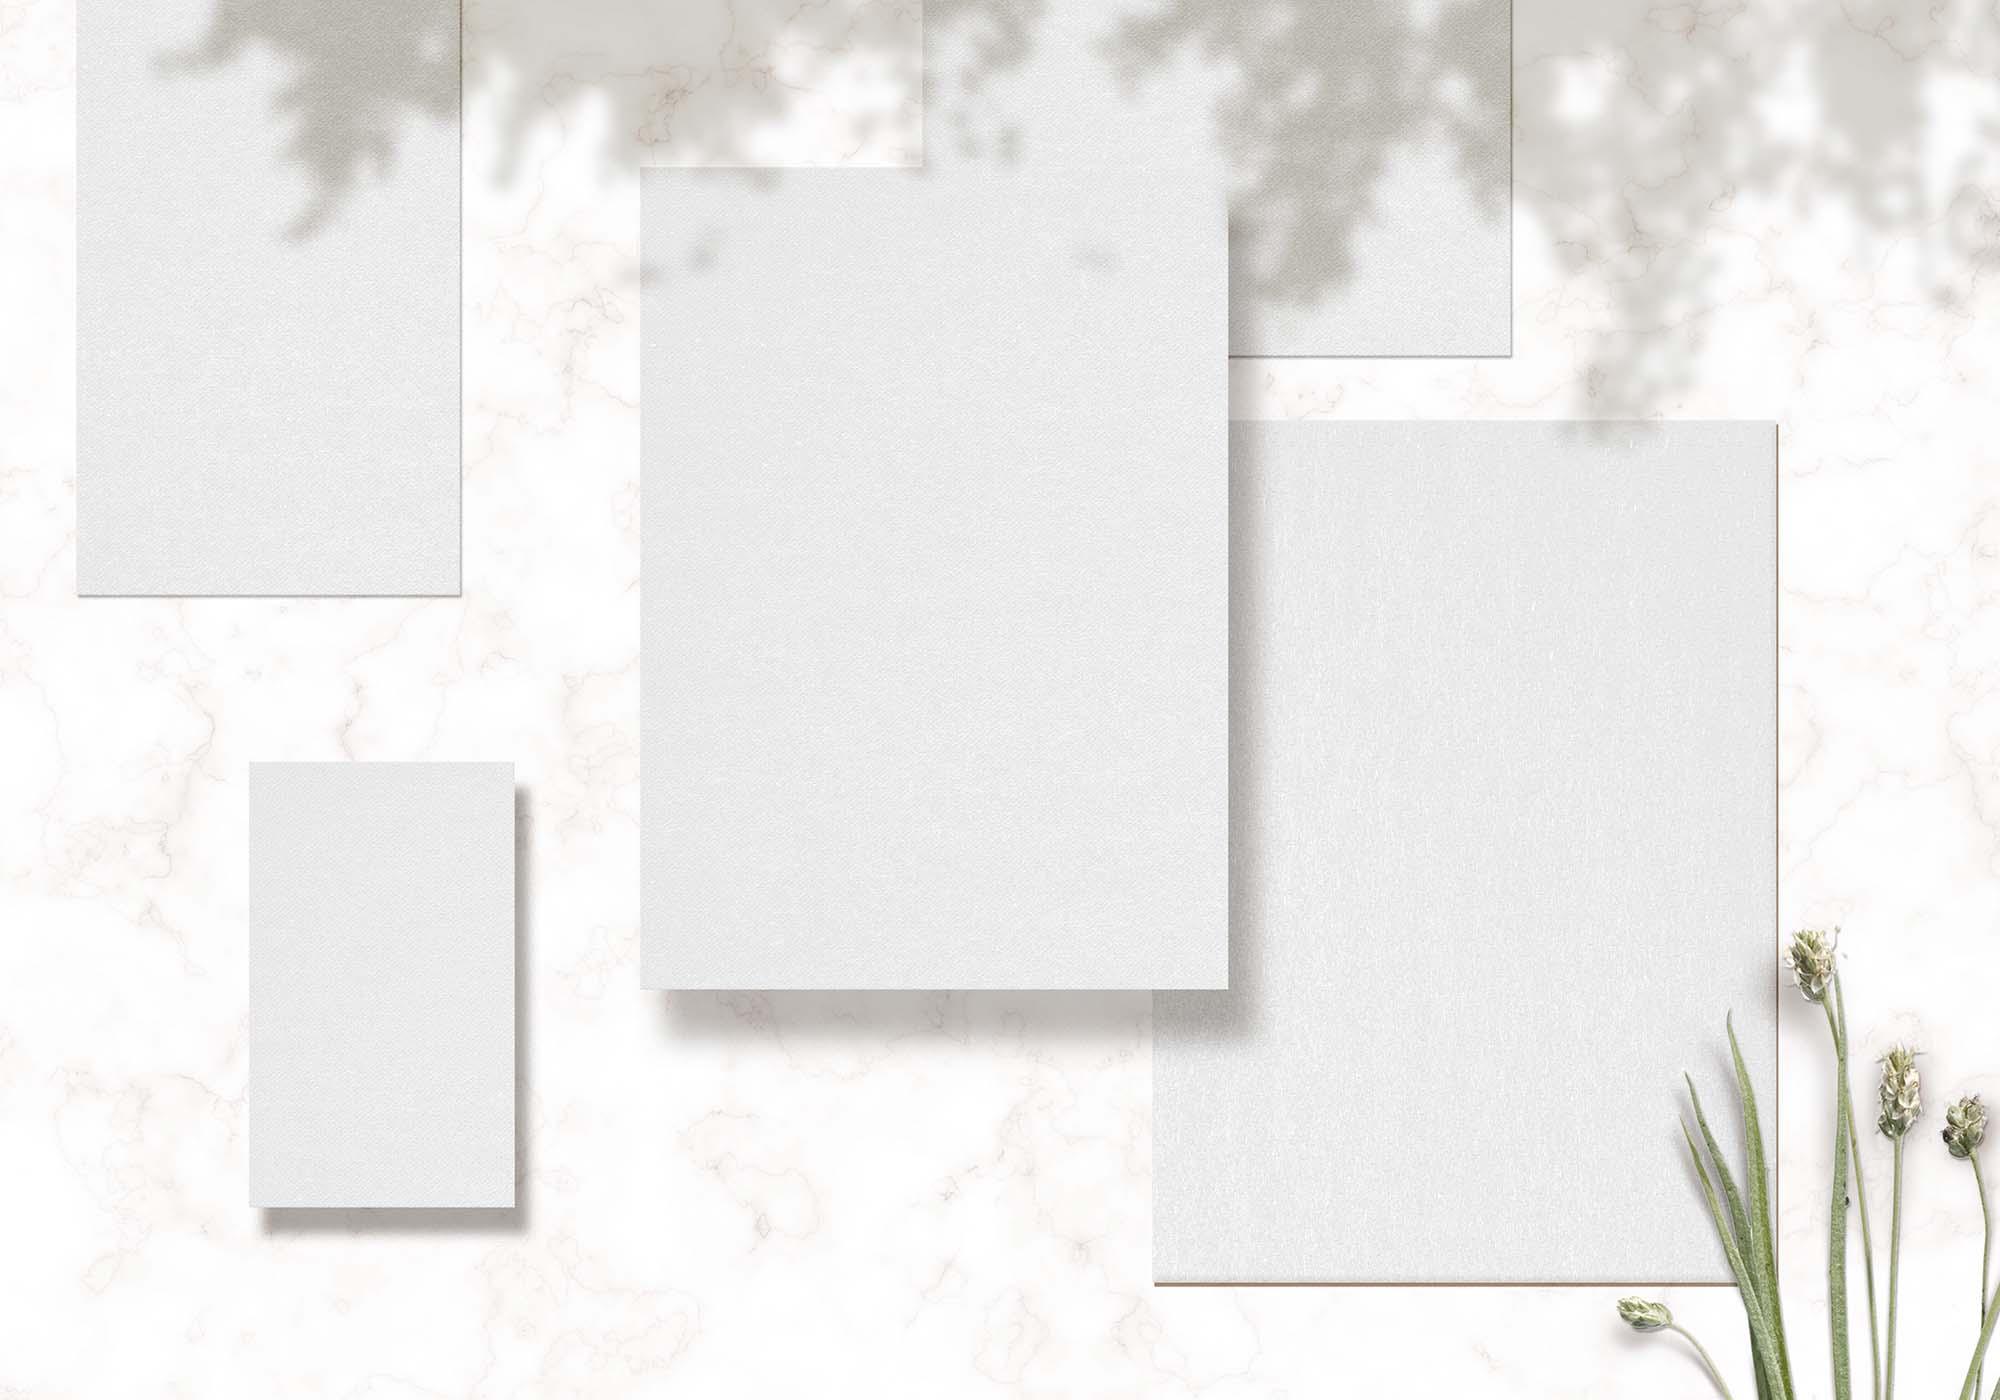 Wedding Cards Mockup 2